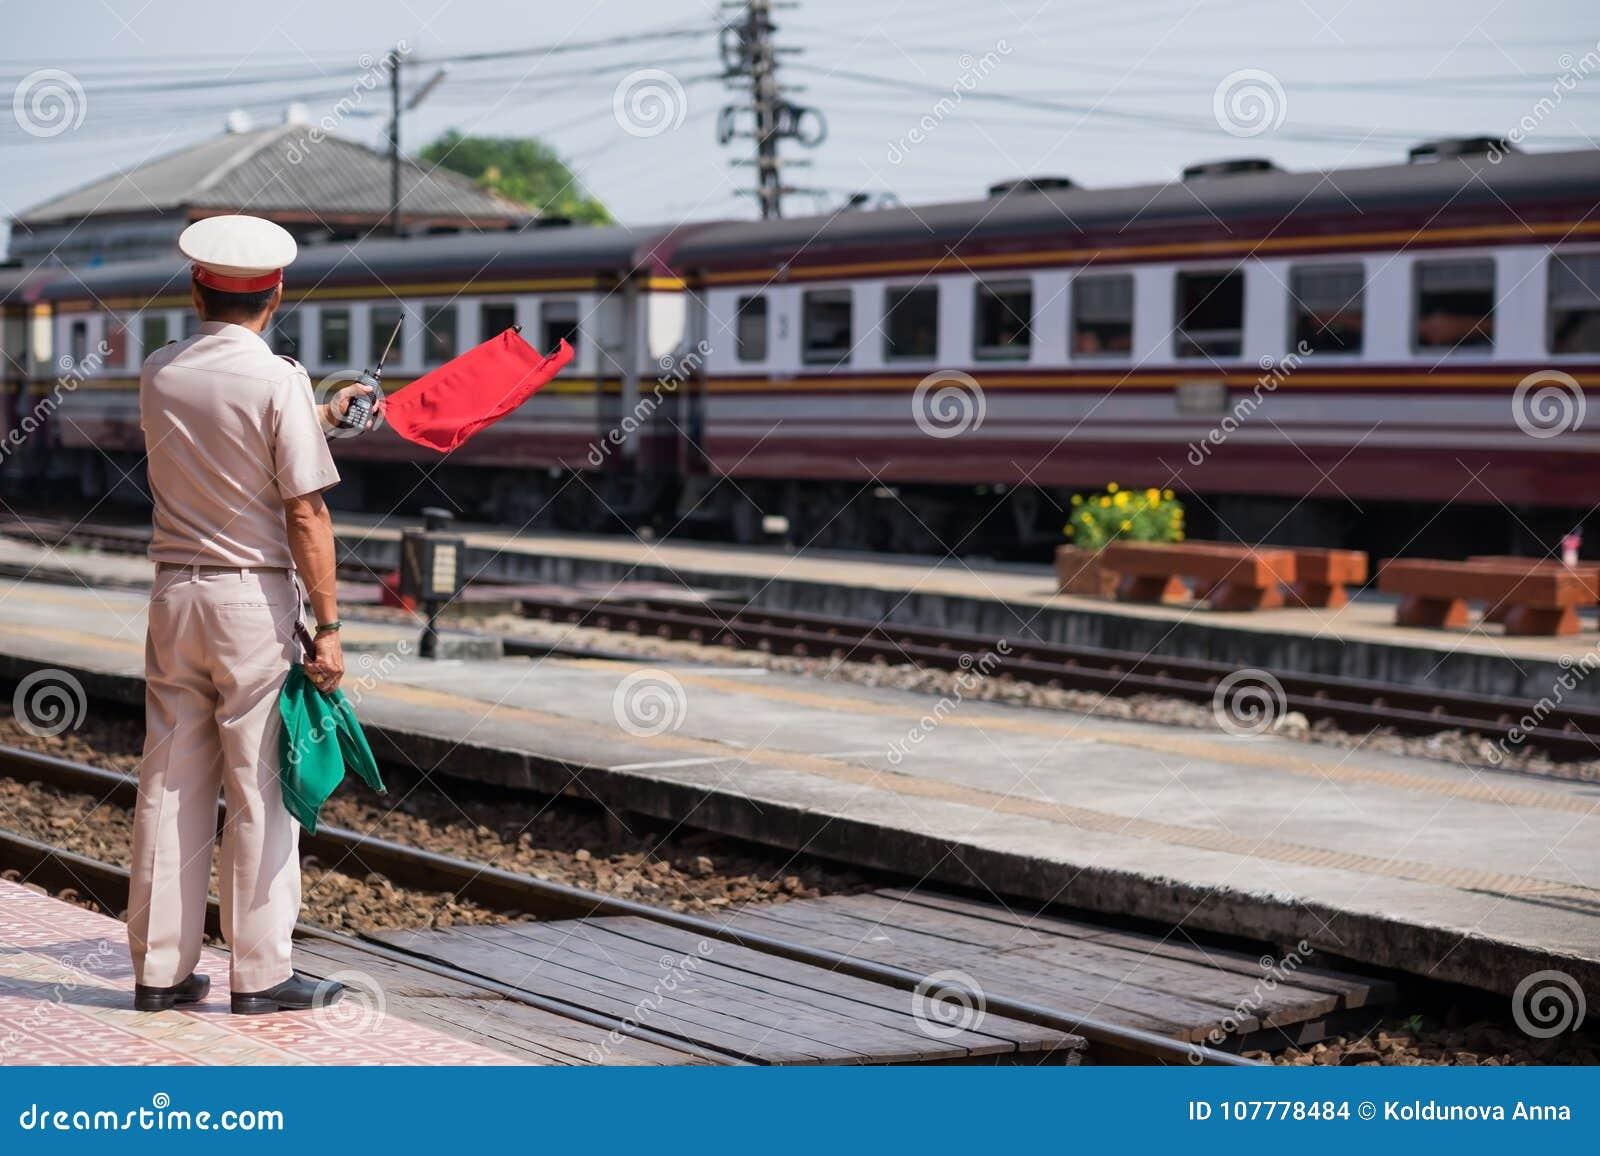 Ayutthaya,Thailand-November 01 2017 :Train Staff Make A